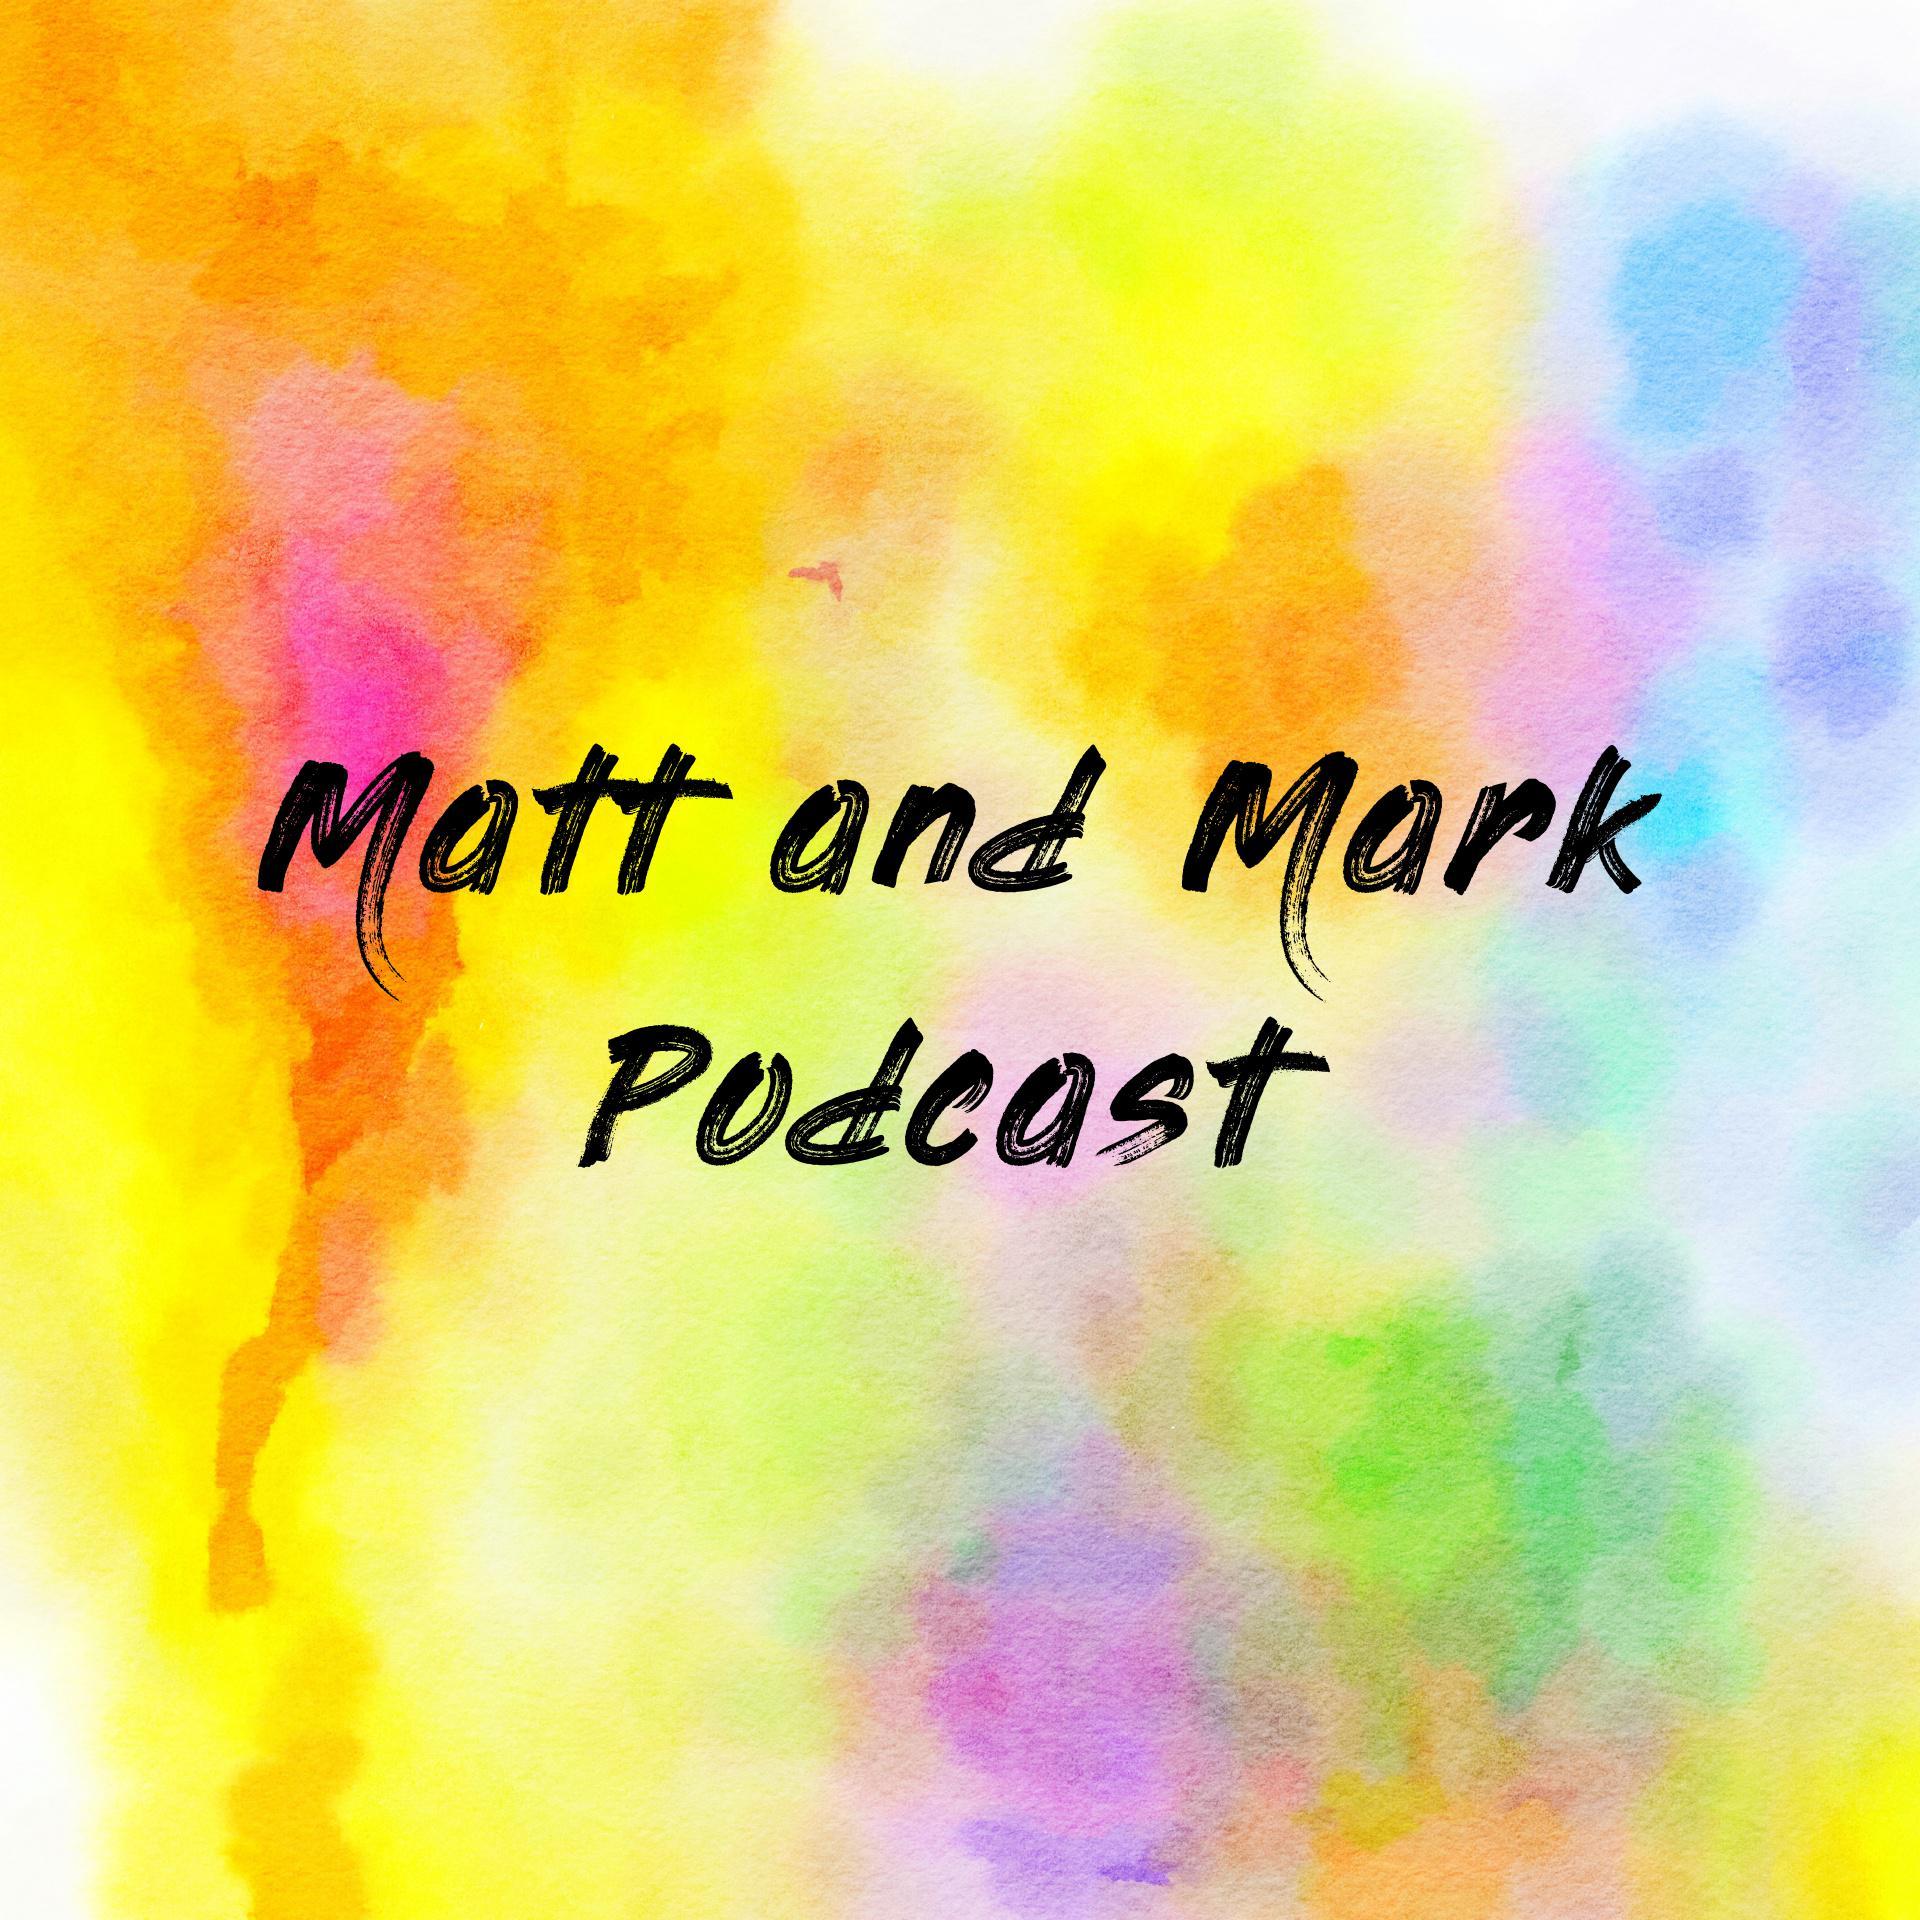 Matt and Mark Podcast